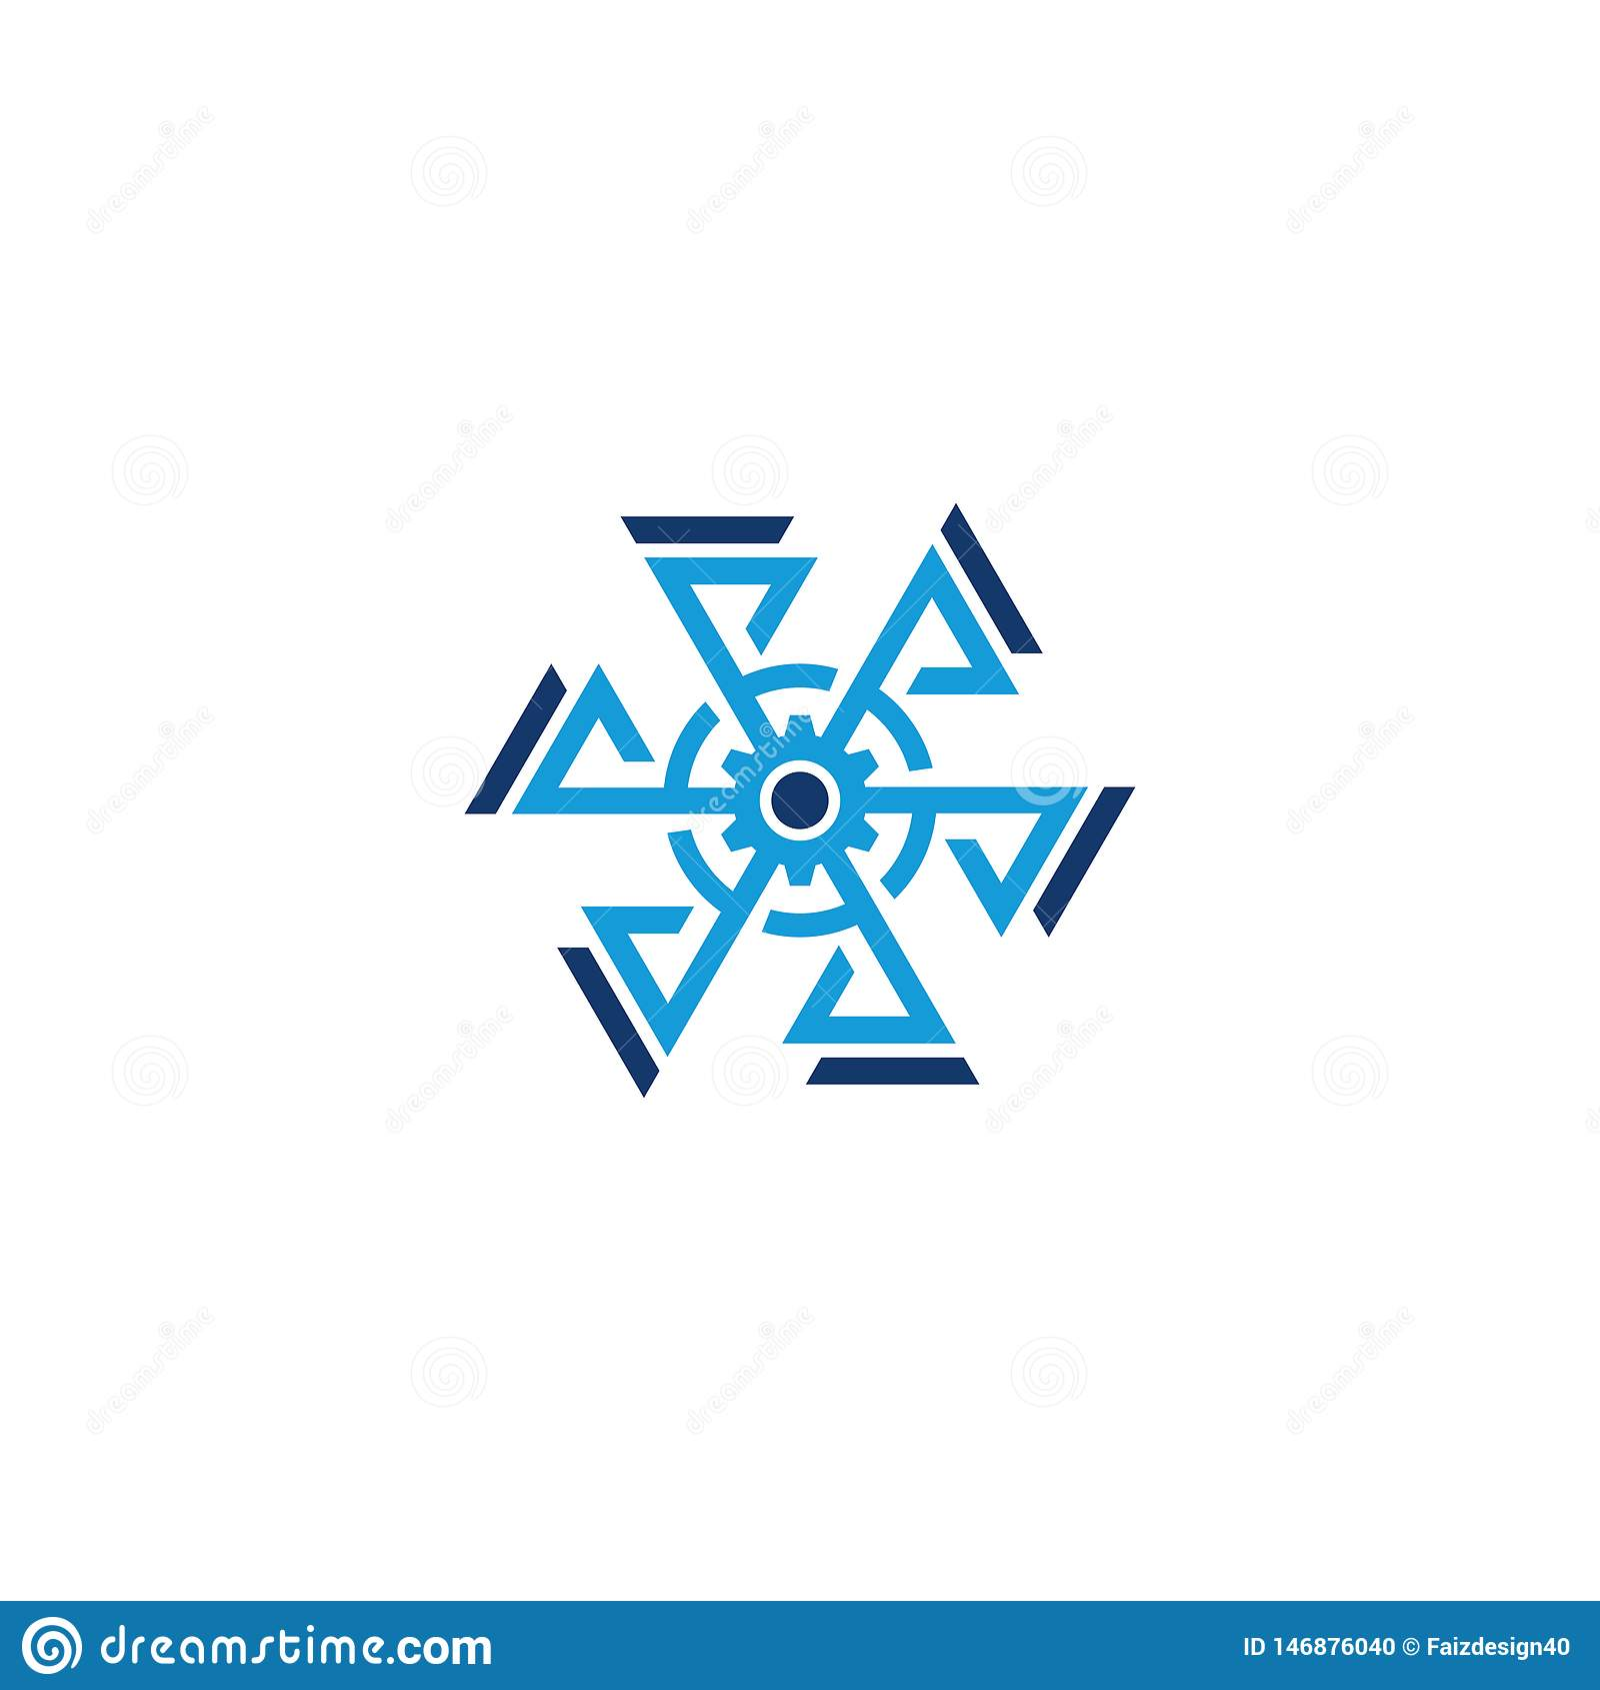 Hexagon επιχειρησιακό λογότυπο βελών εργαλείων